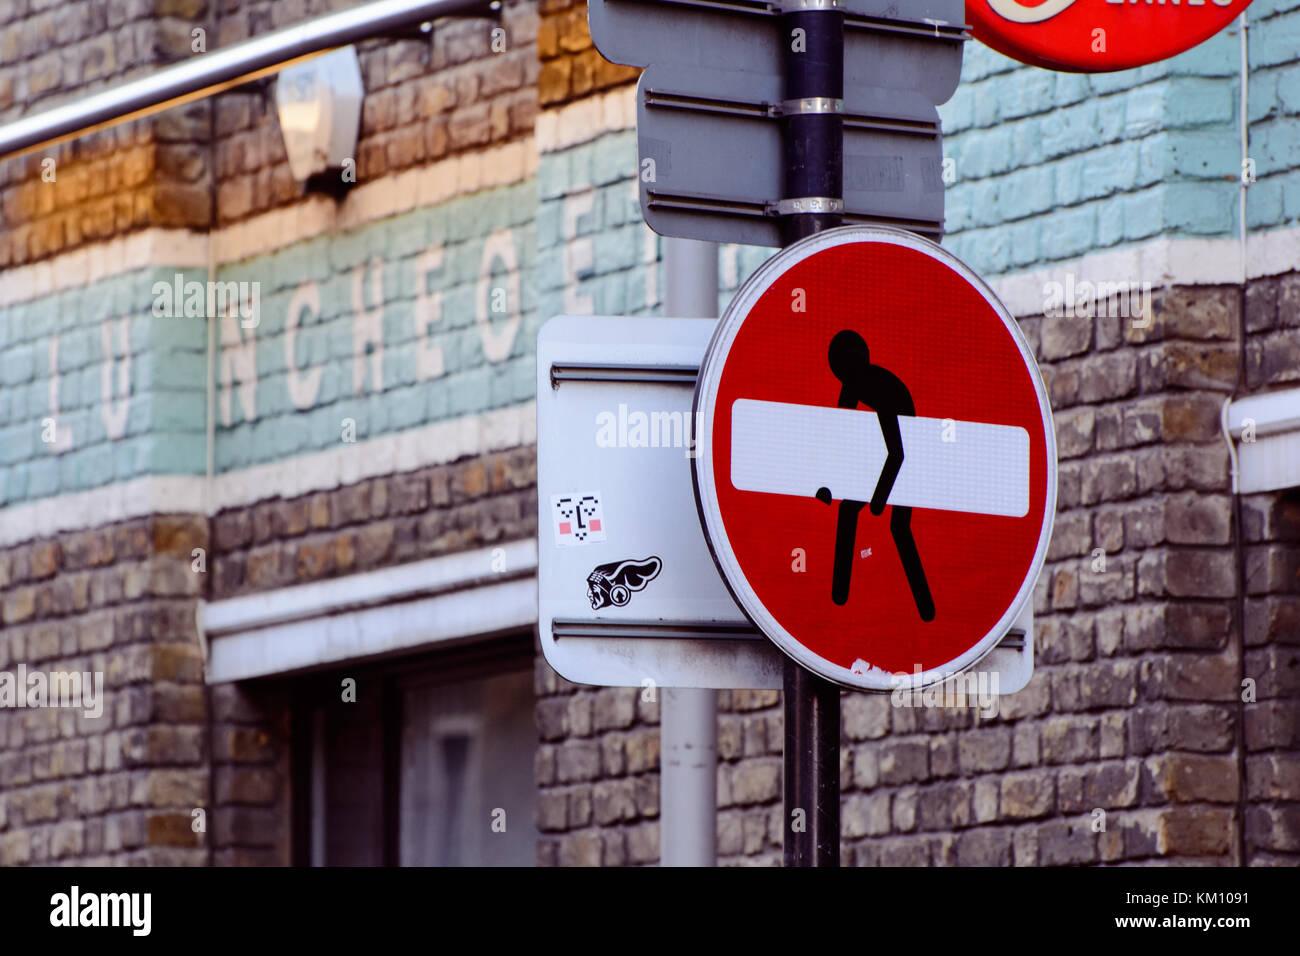 Art sticker on no entry sign in Brick Lane. London, 2016. Landscape format. - Stock Image